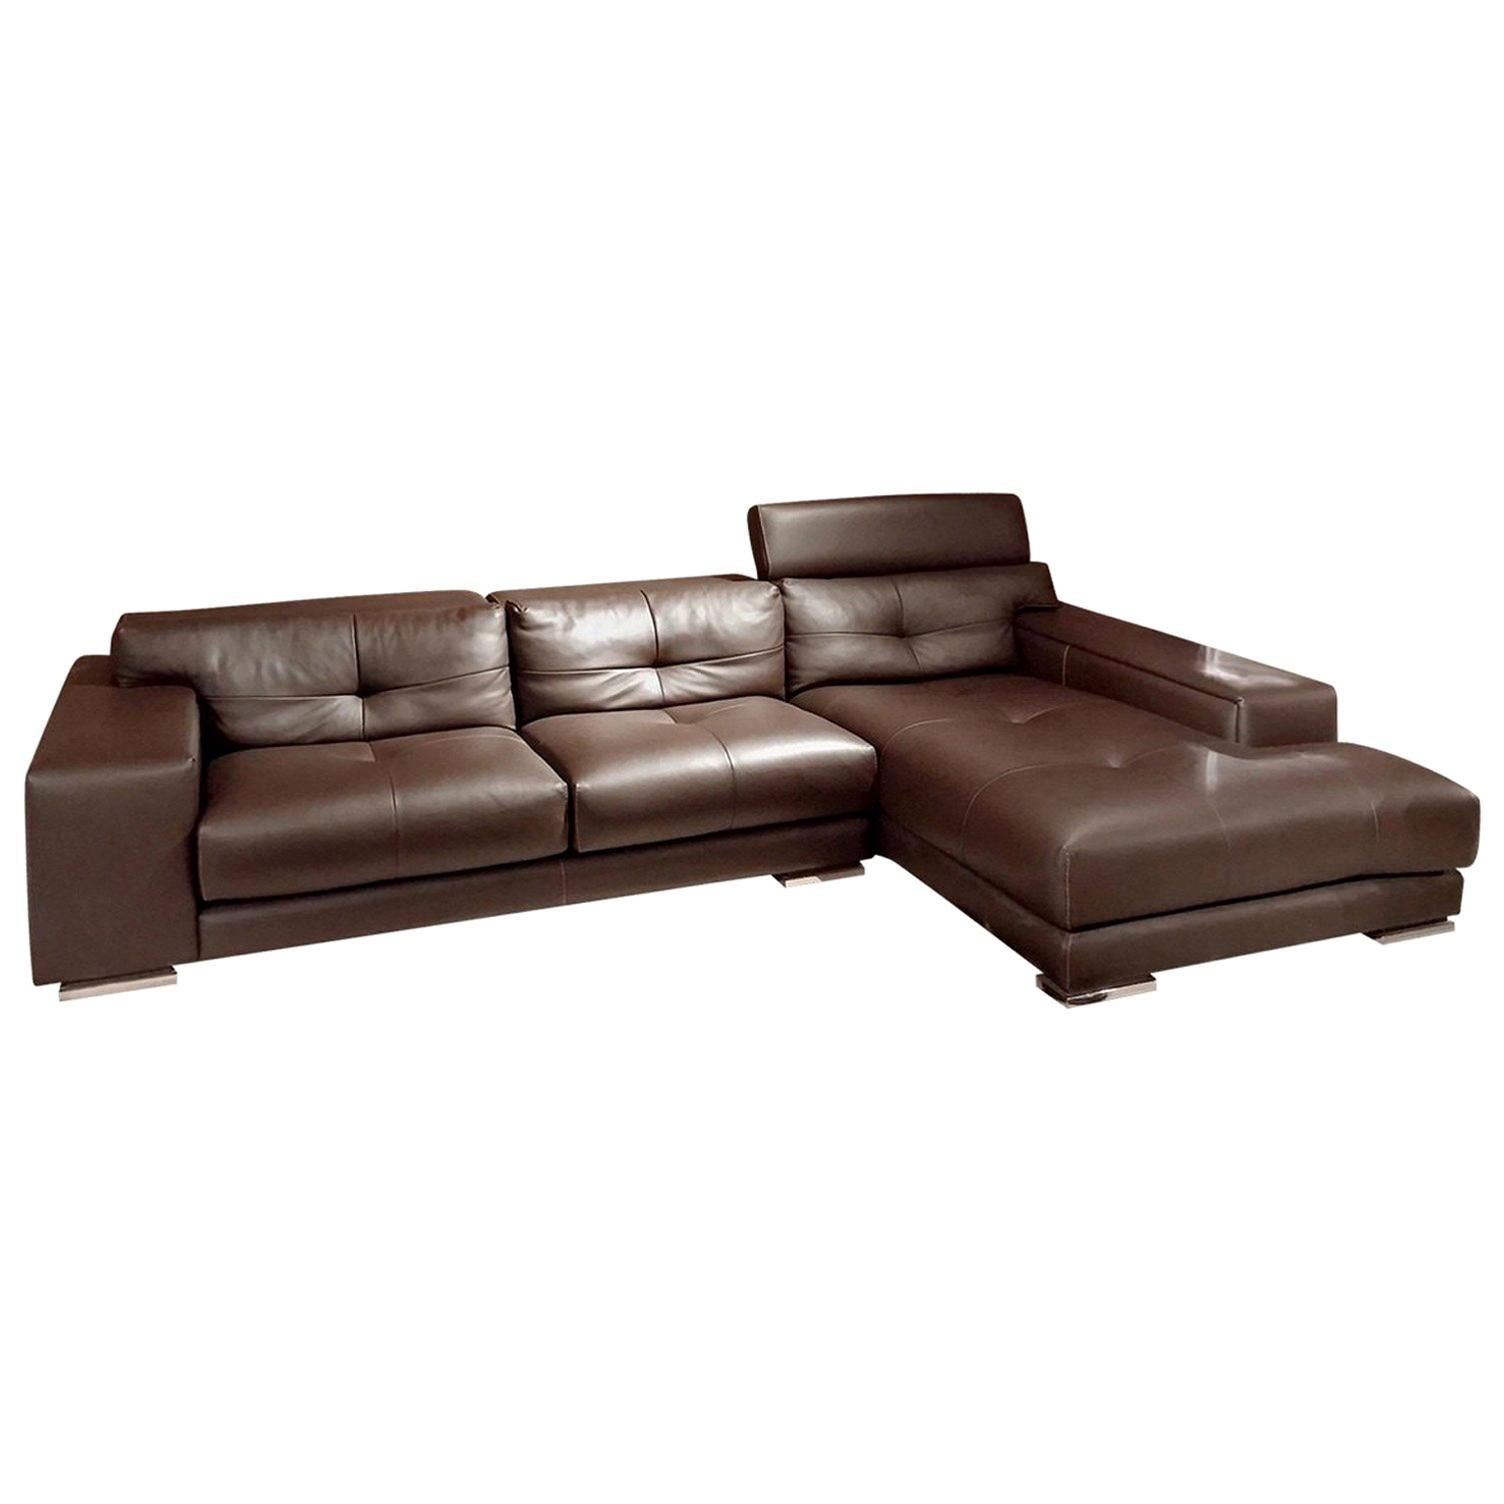 Italian Gamma Soleado Dark Brown Leather Sectional Sofa Chaise